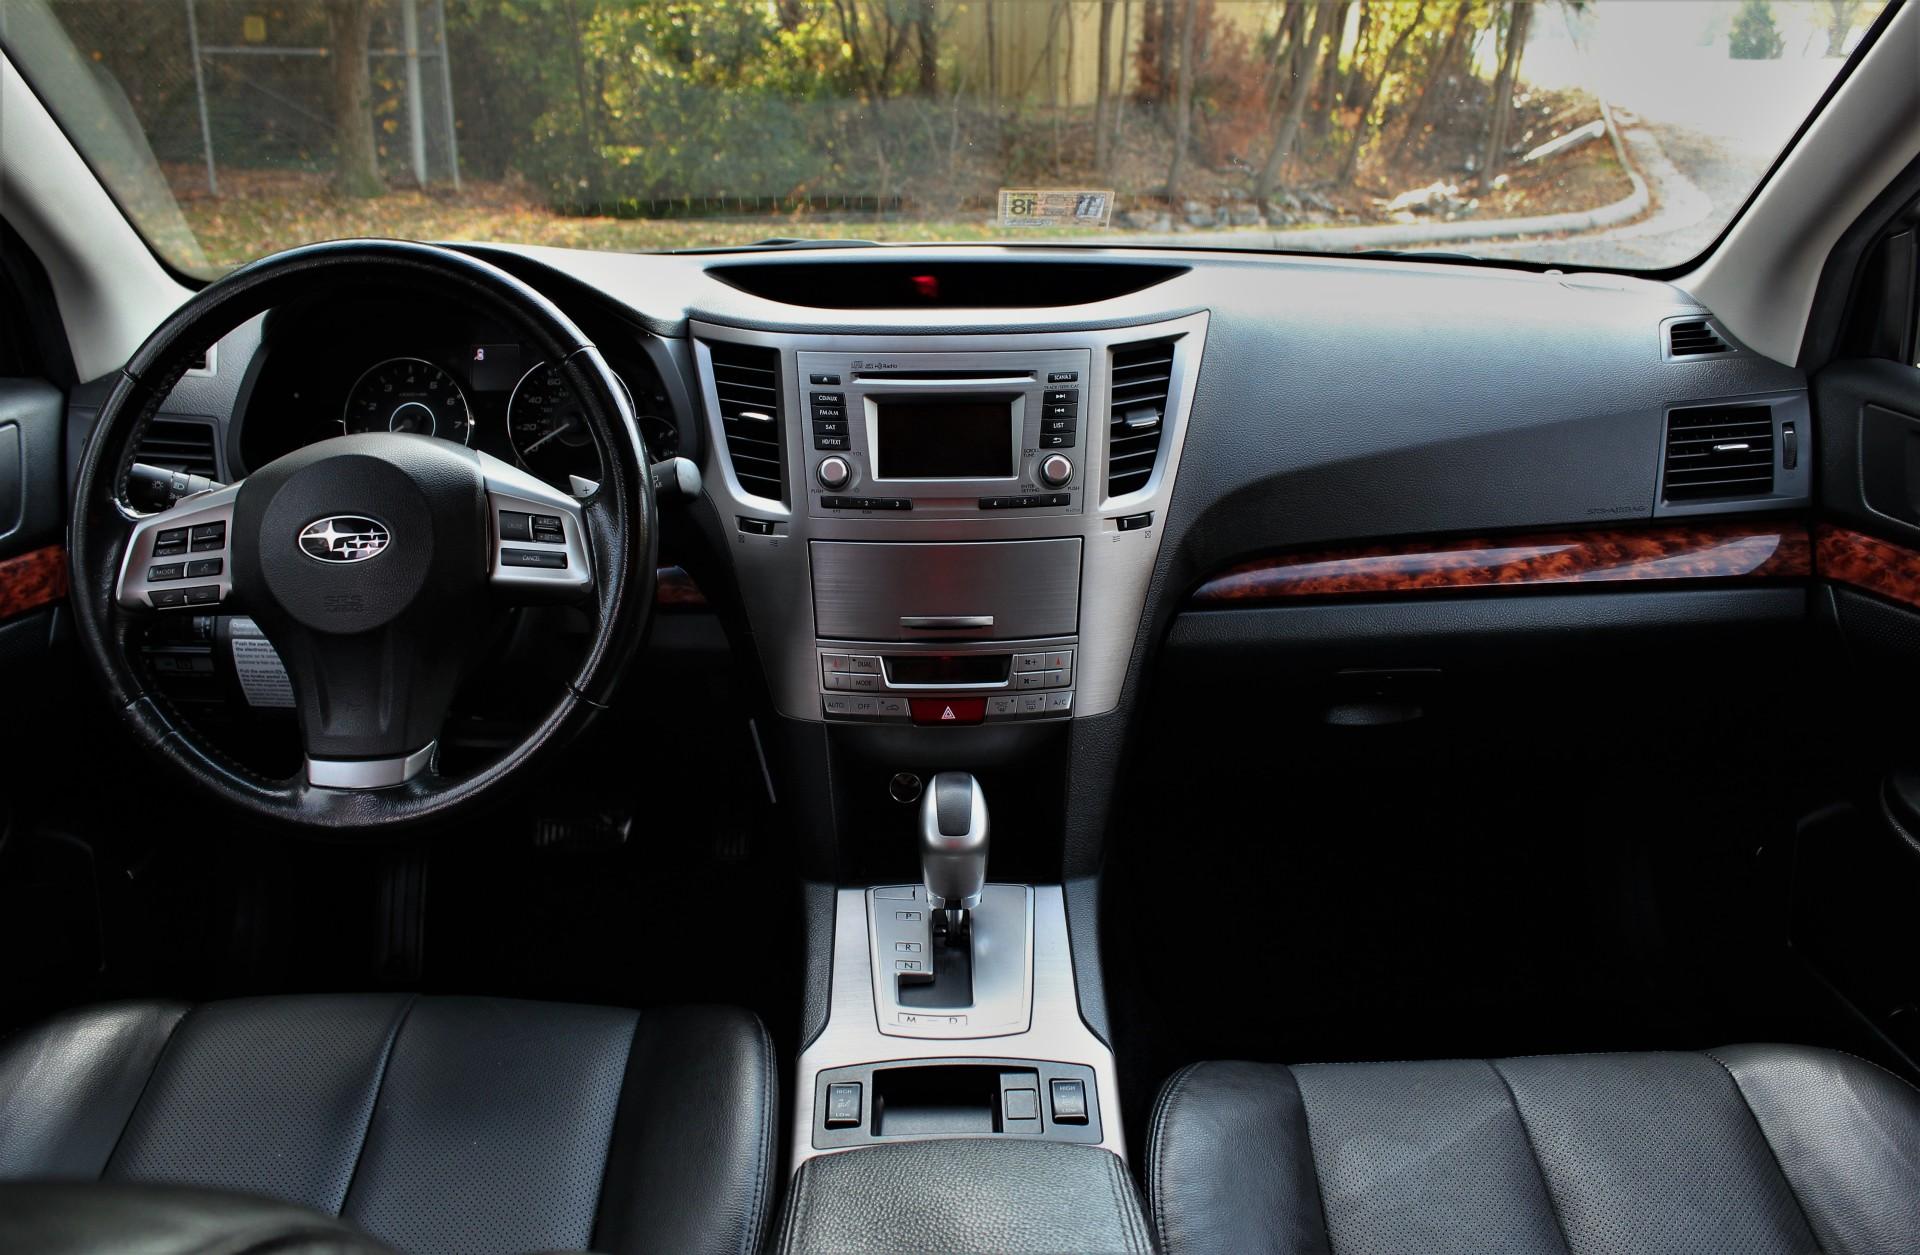 2012 Subaru Outback Limited